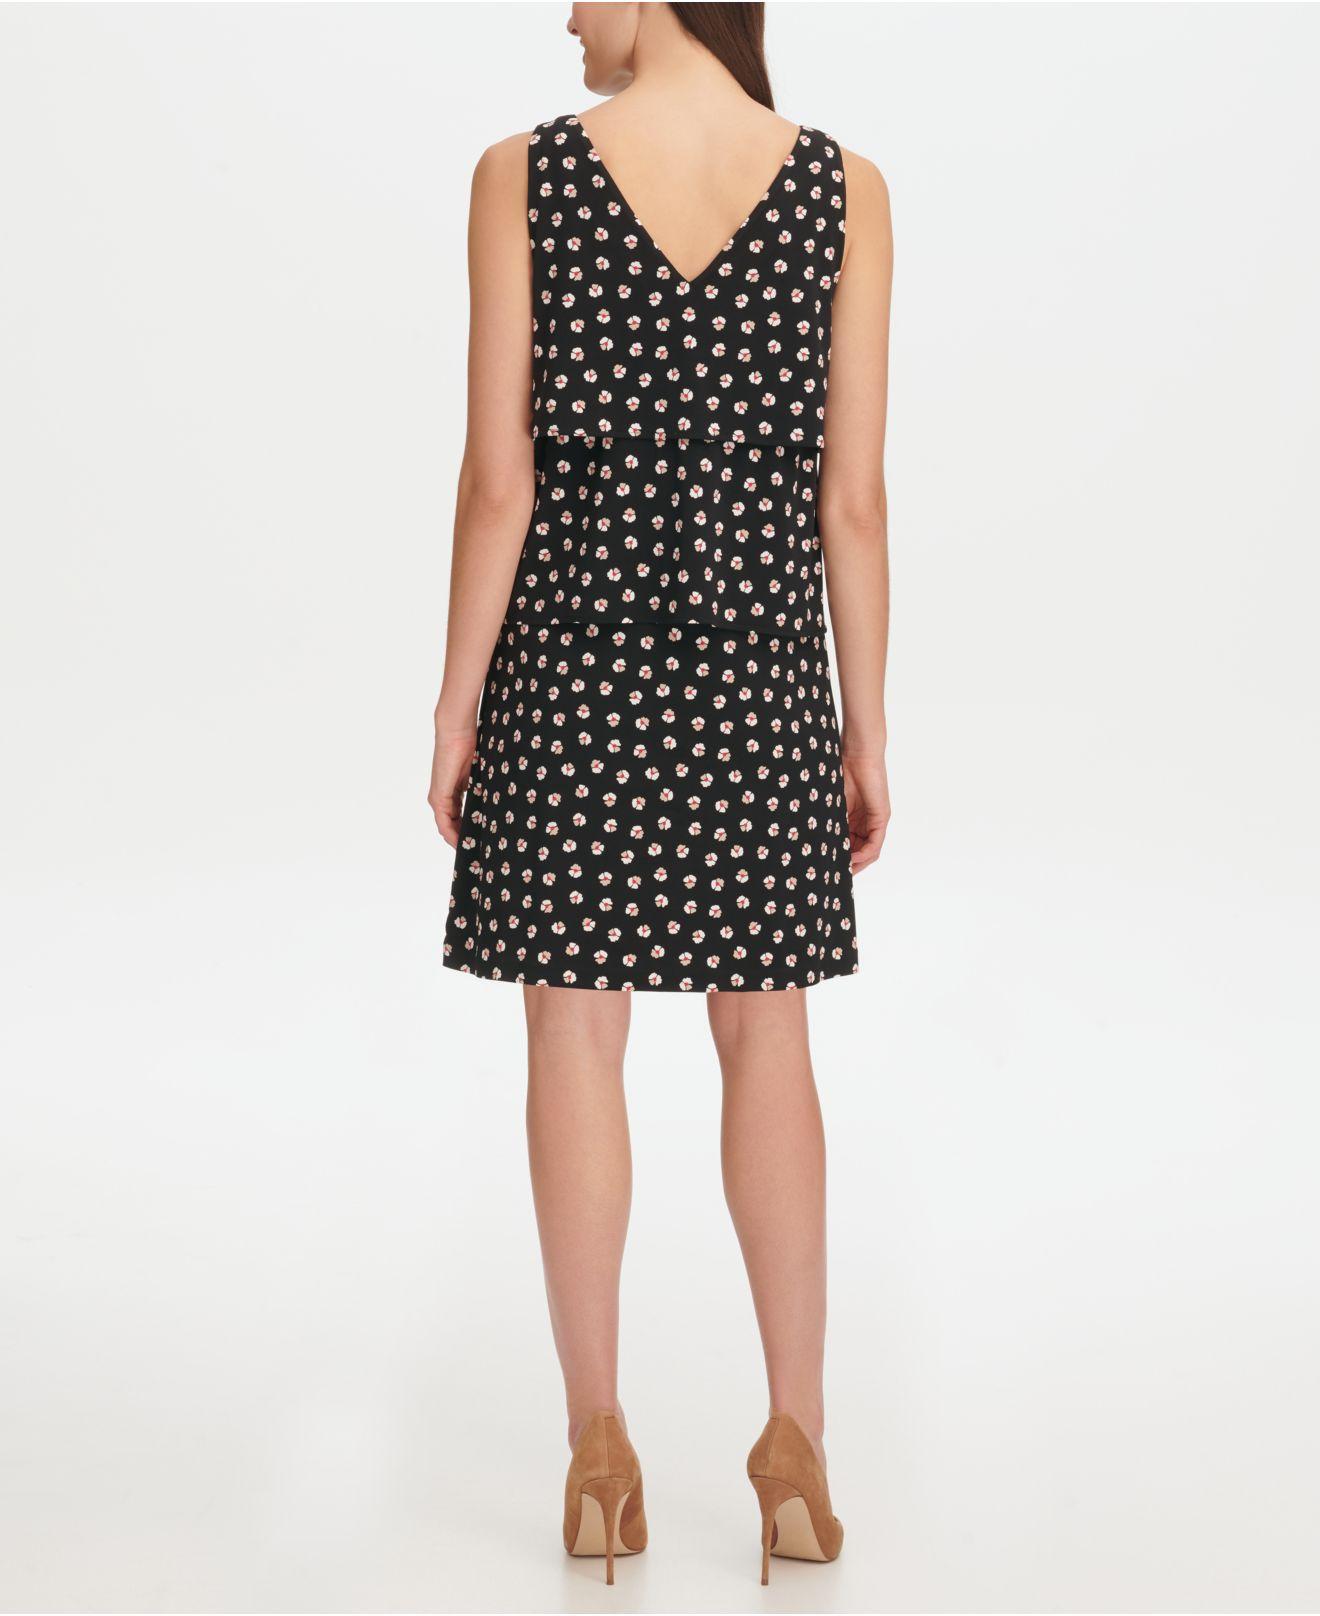 88e84f75aa7 Lyst - Tommy Hilfiger Floral Jersey Tier A-line Dress in Black